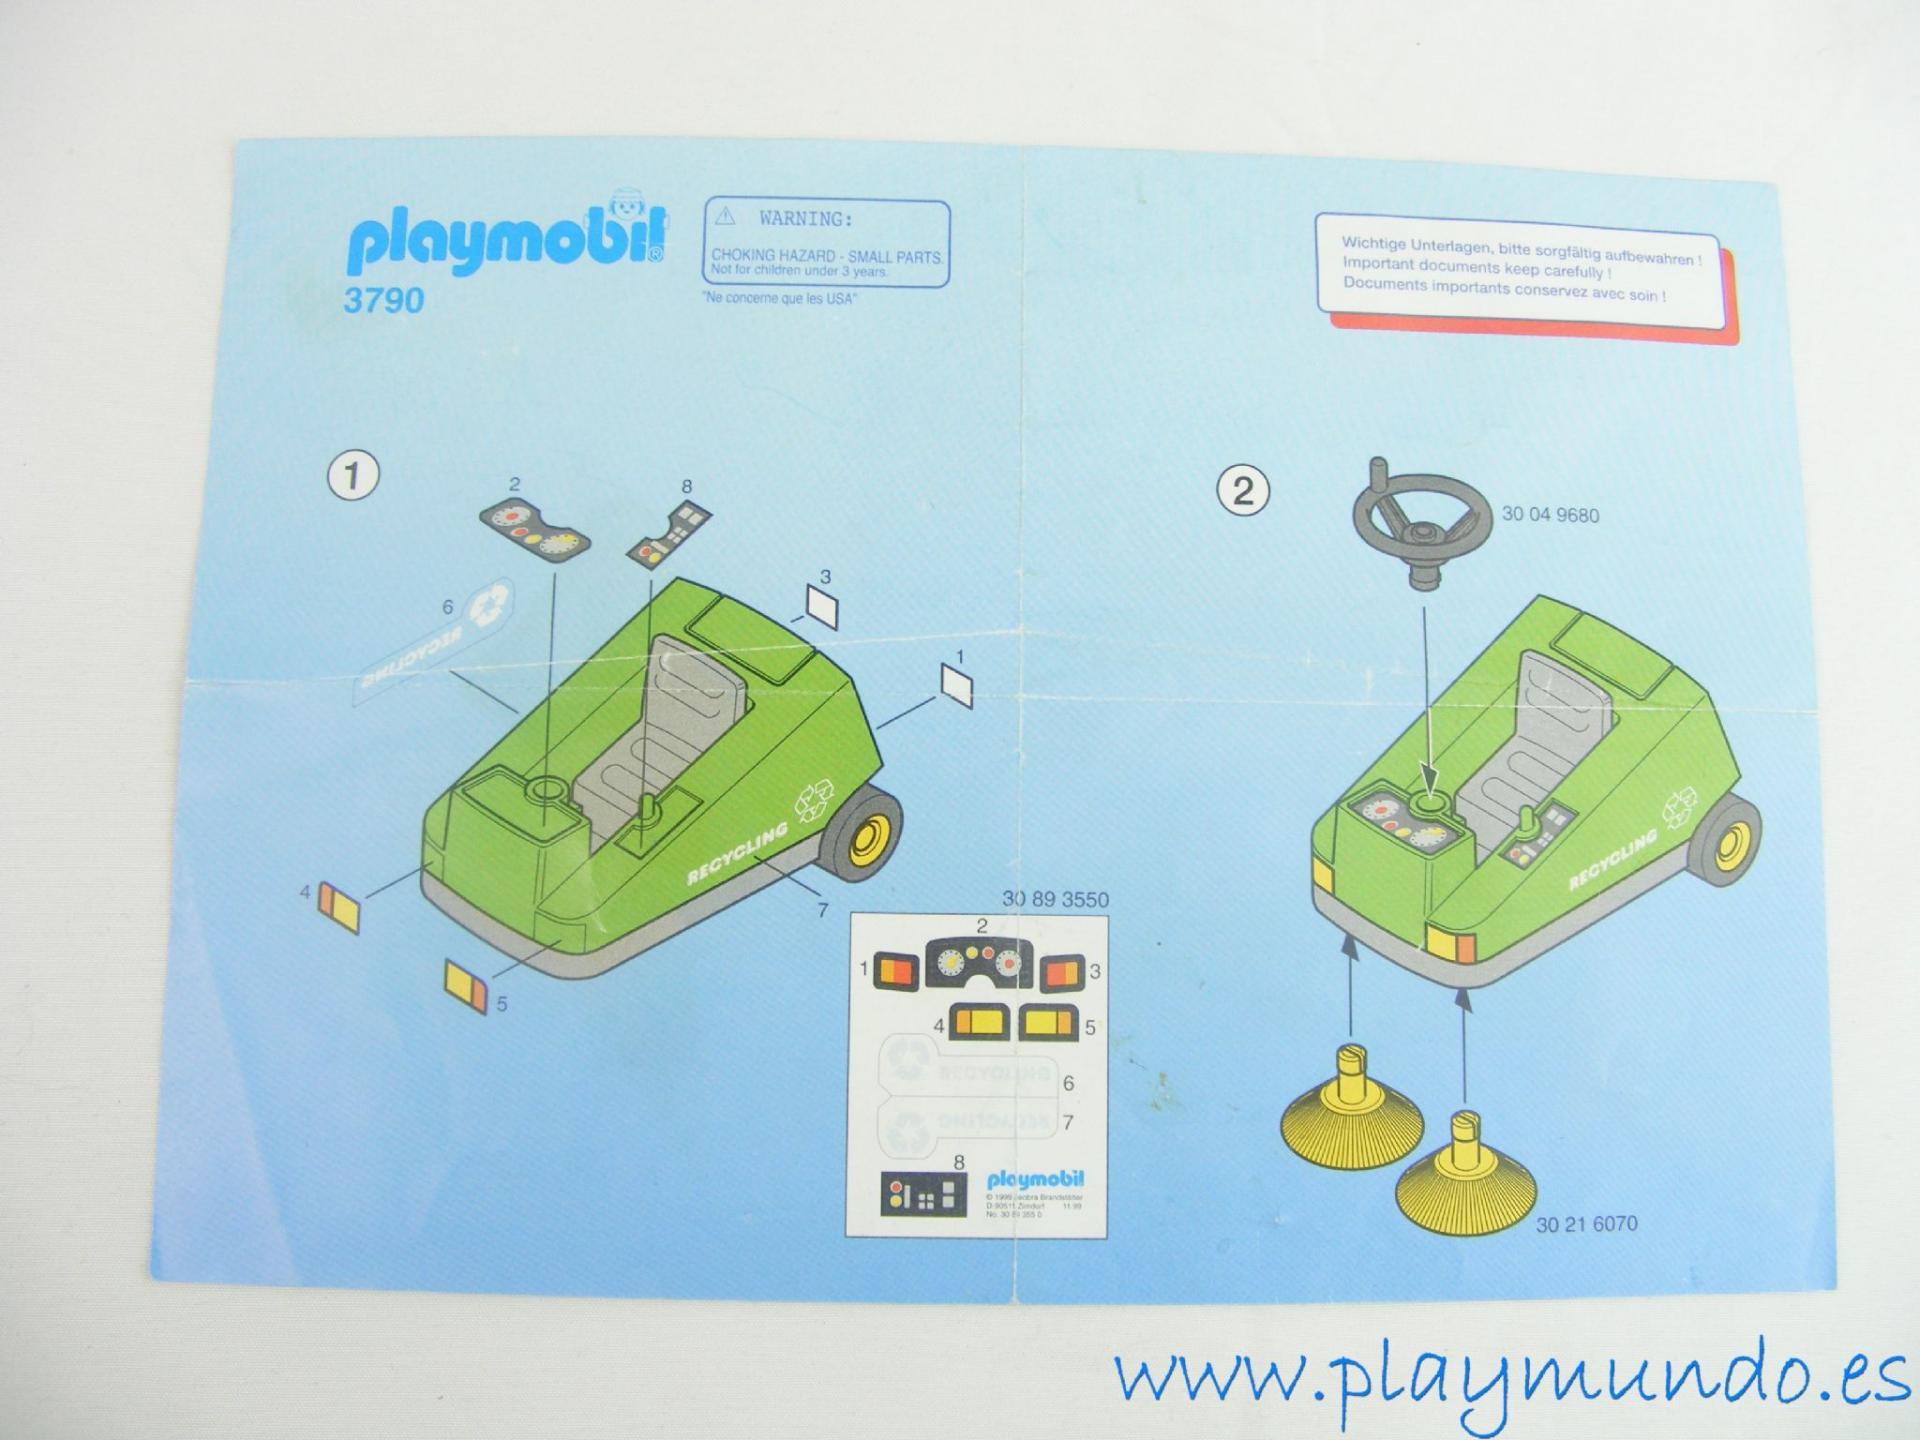 PLAYMOBIL MANUAL BARREDORA REF. 3790